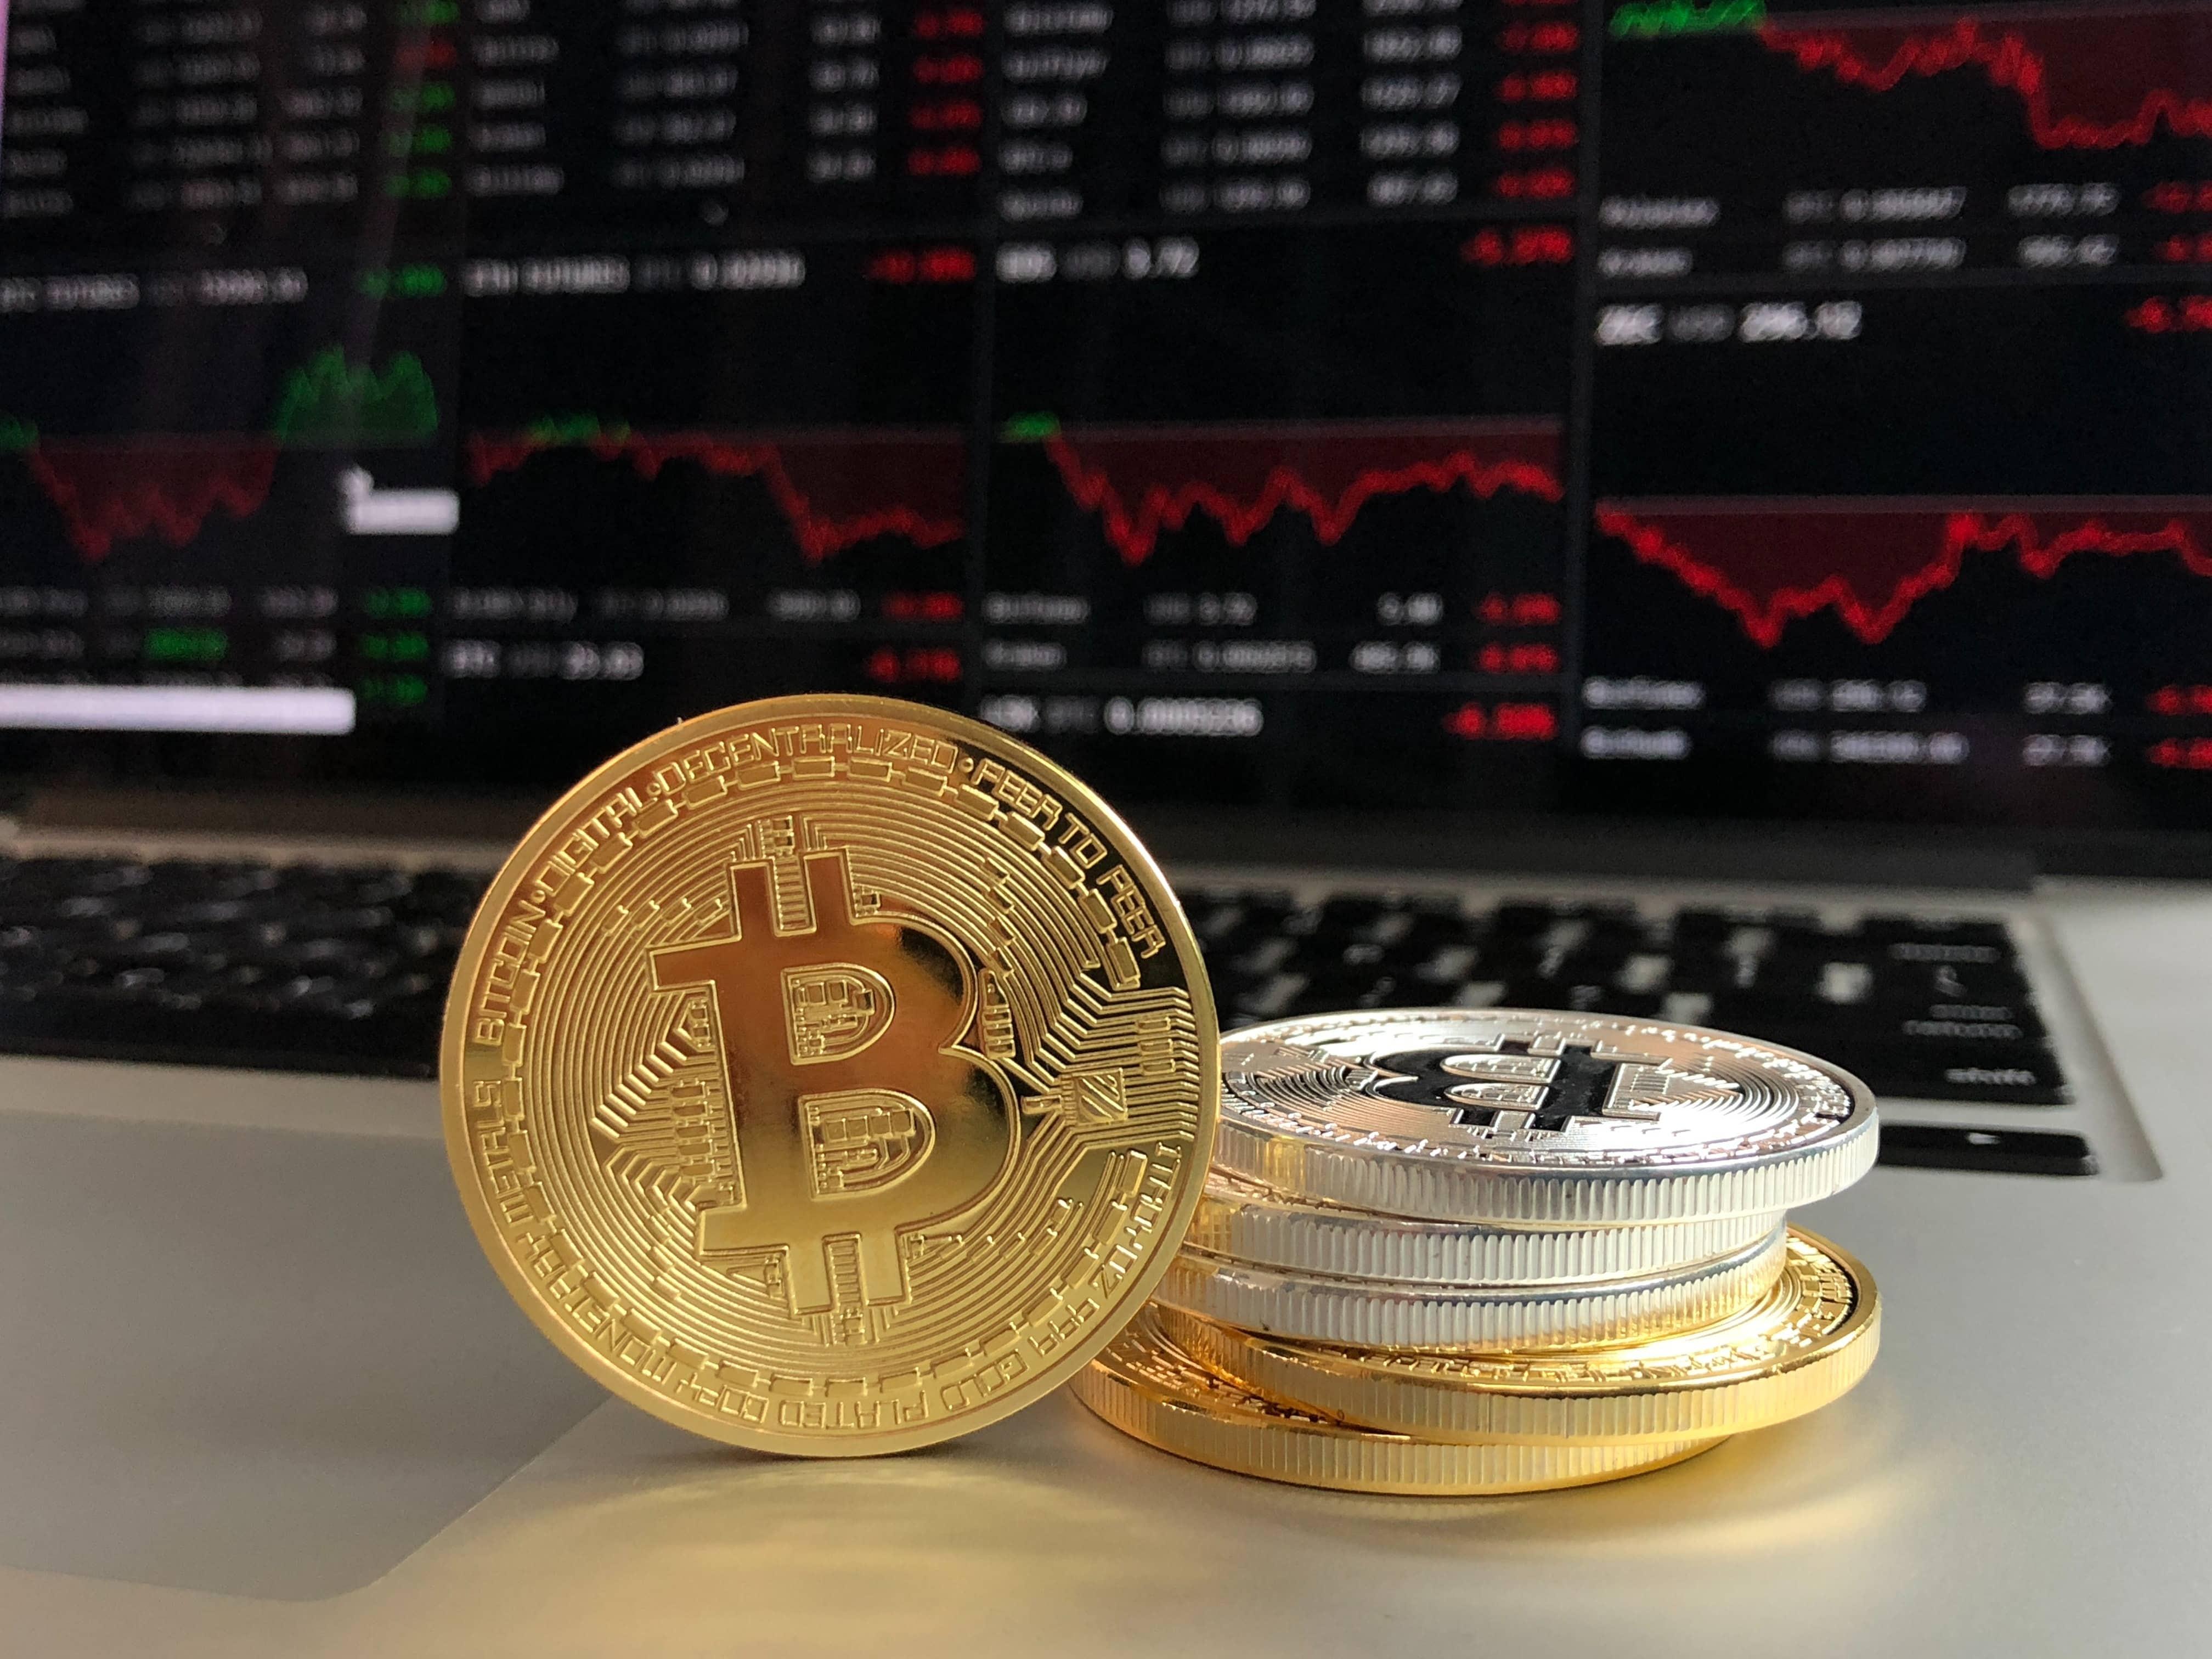 Cryptocurrency Market Update – Bitcoin, Ethereum, Ripple, Litecoin